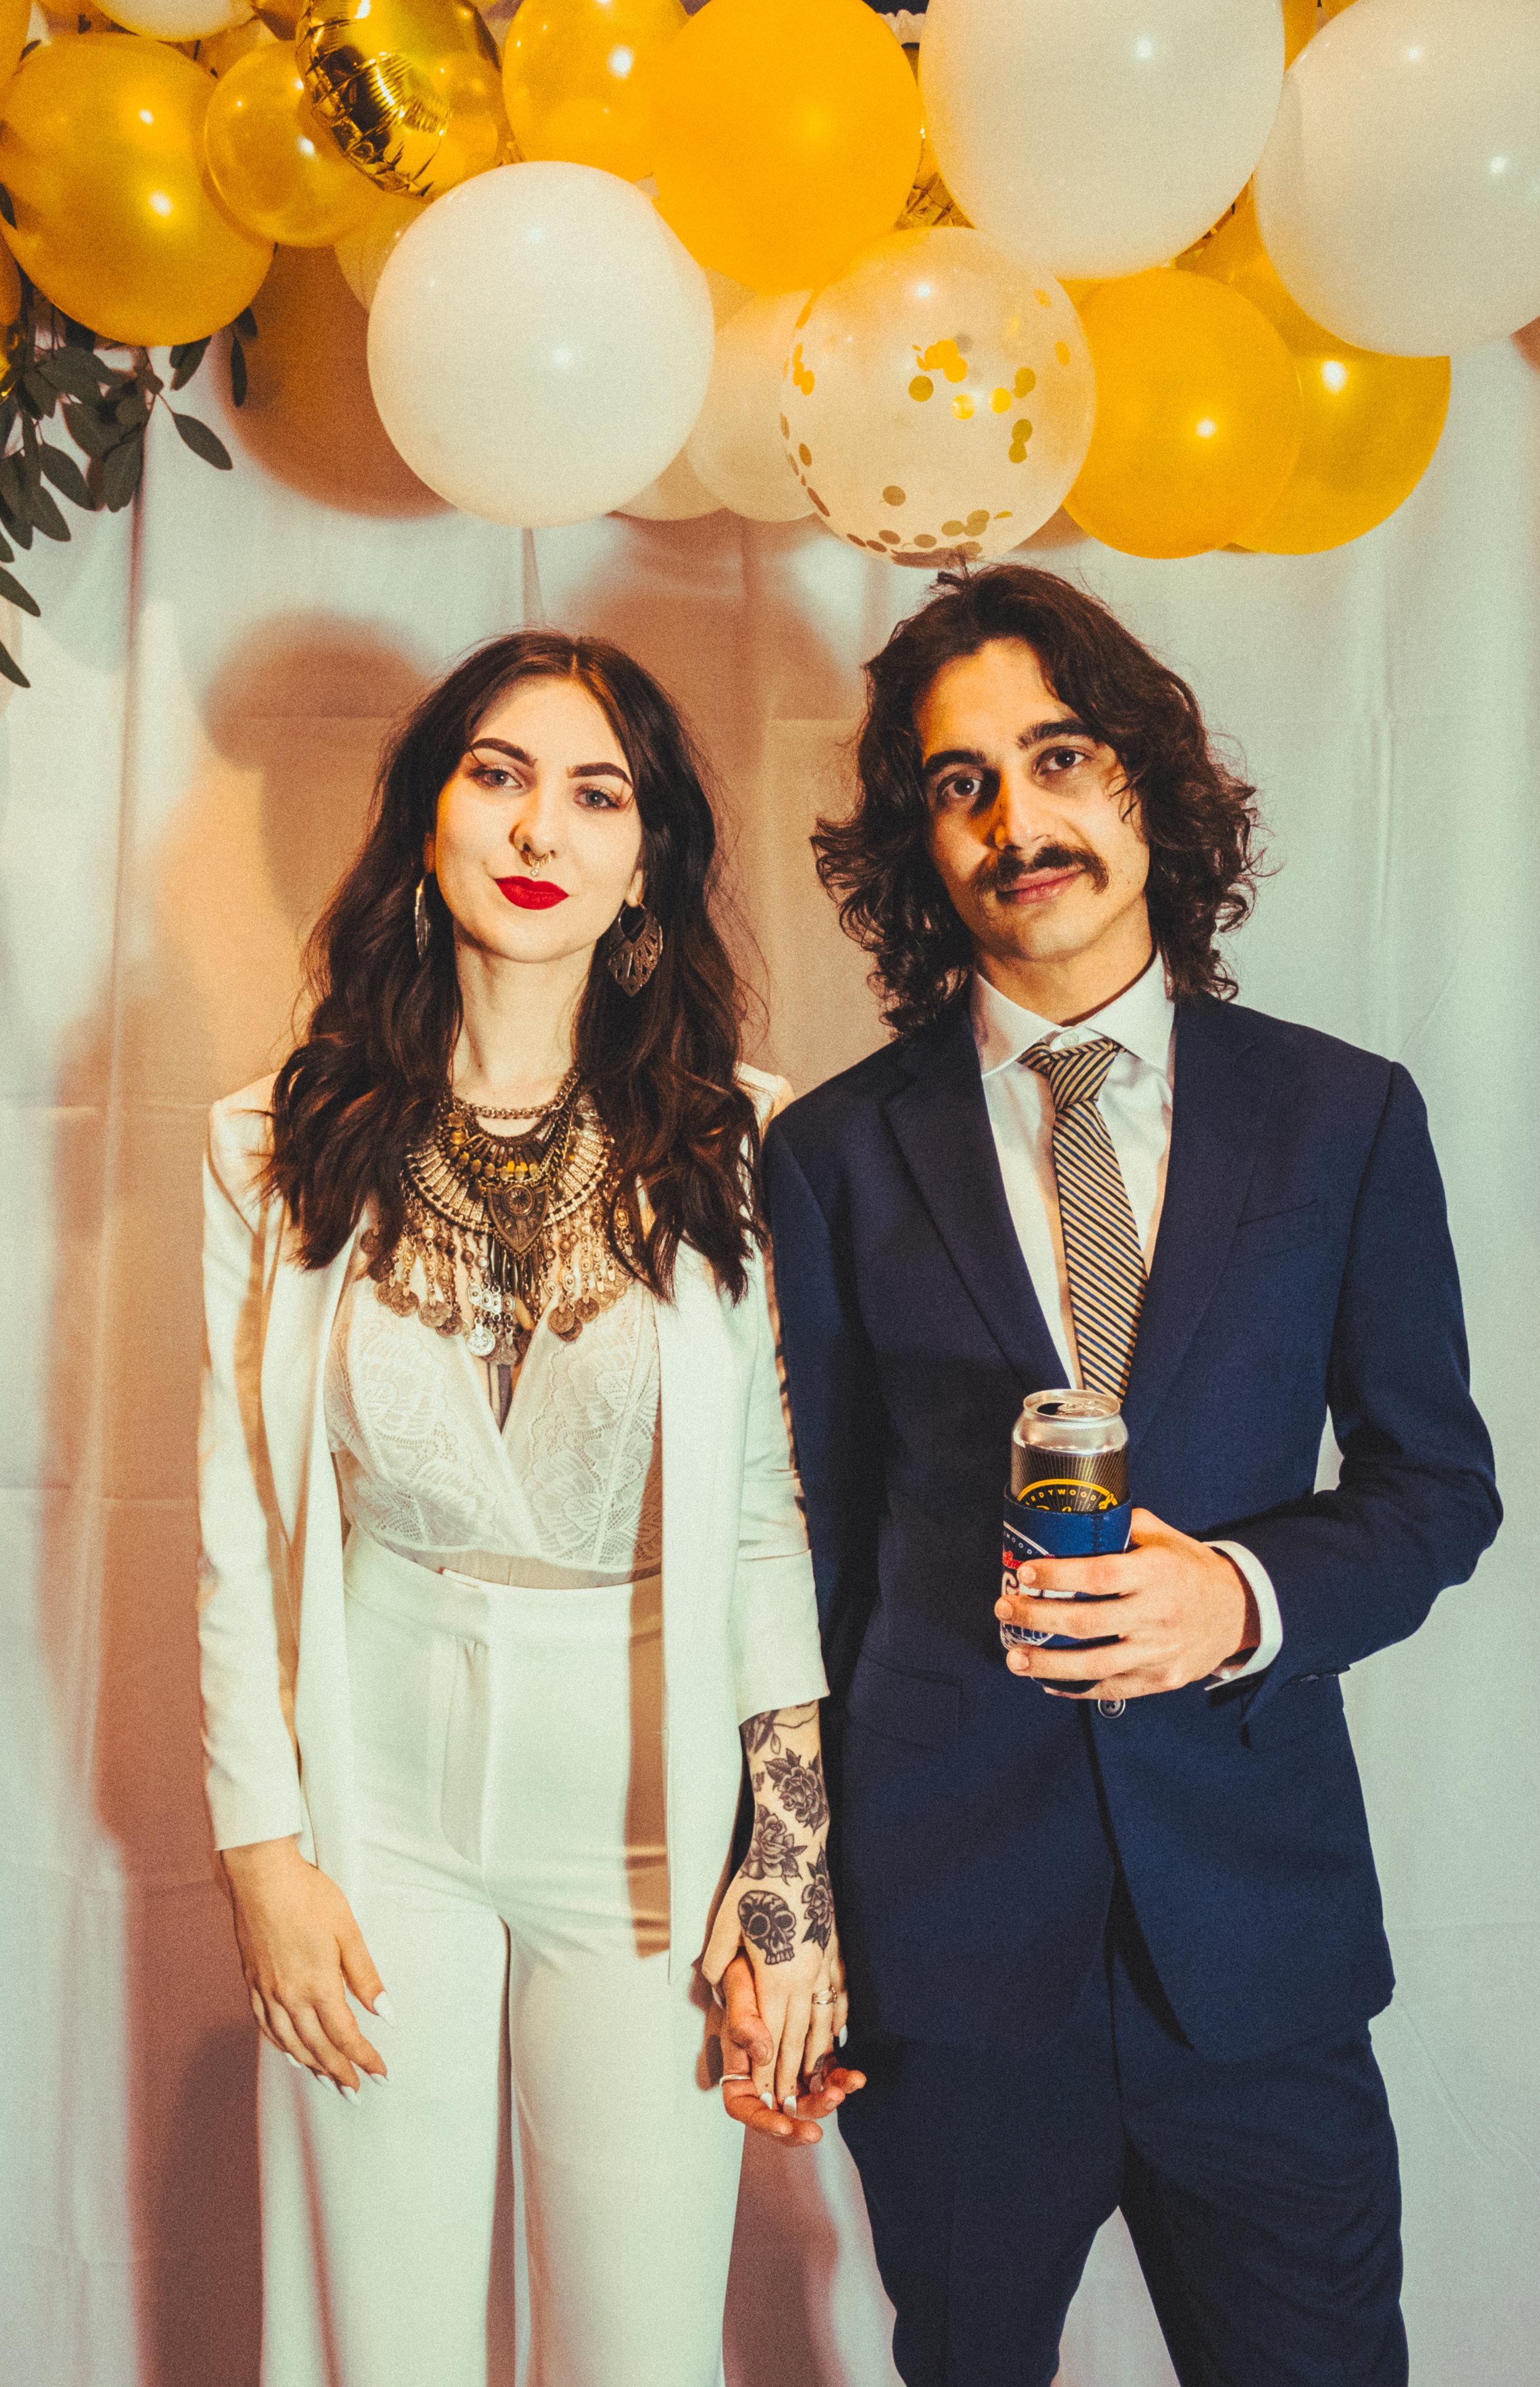 Max-Addie-Wedding_April 06, 2019_028.jpg